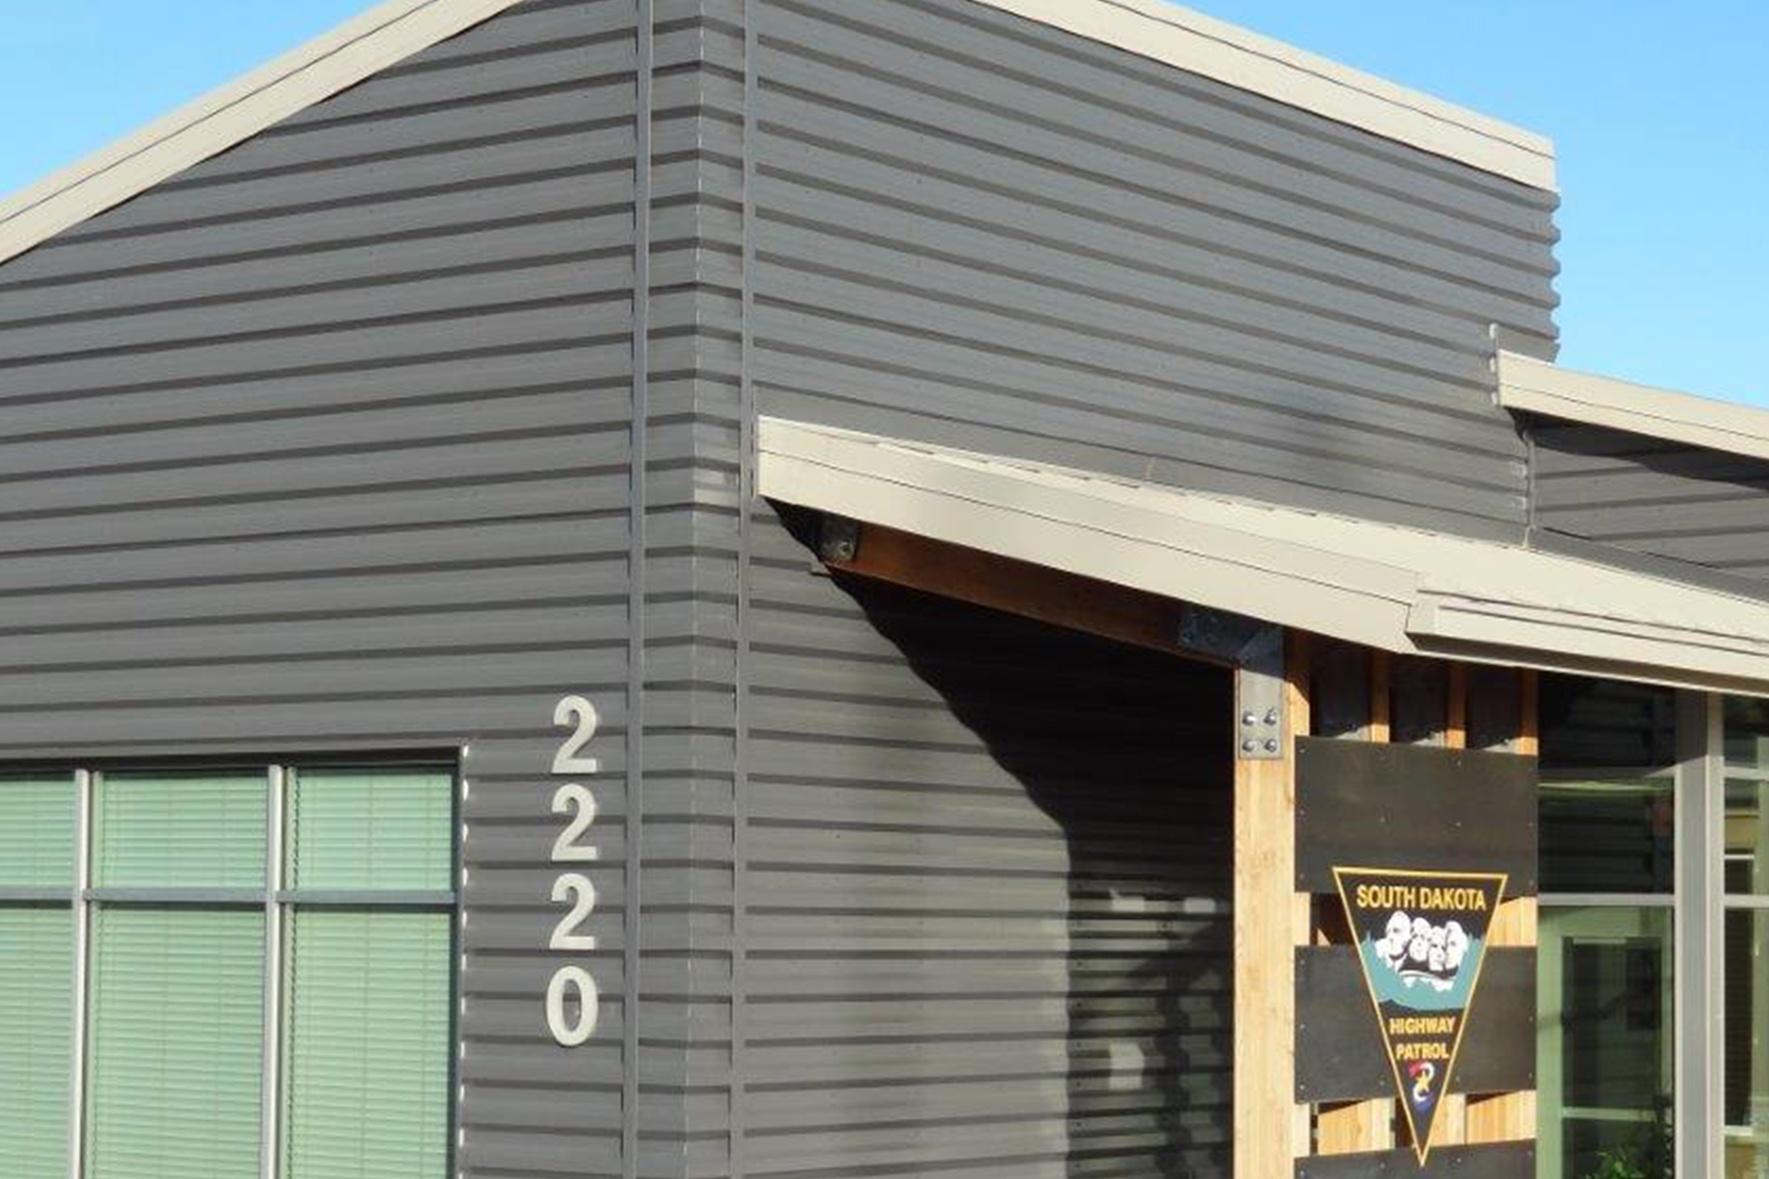 Metal Siding Panels Box Rib Pictures Google Search Building Siding Metal Siding Replacing Siding